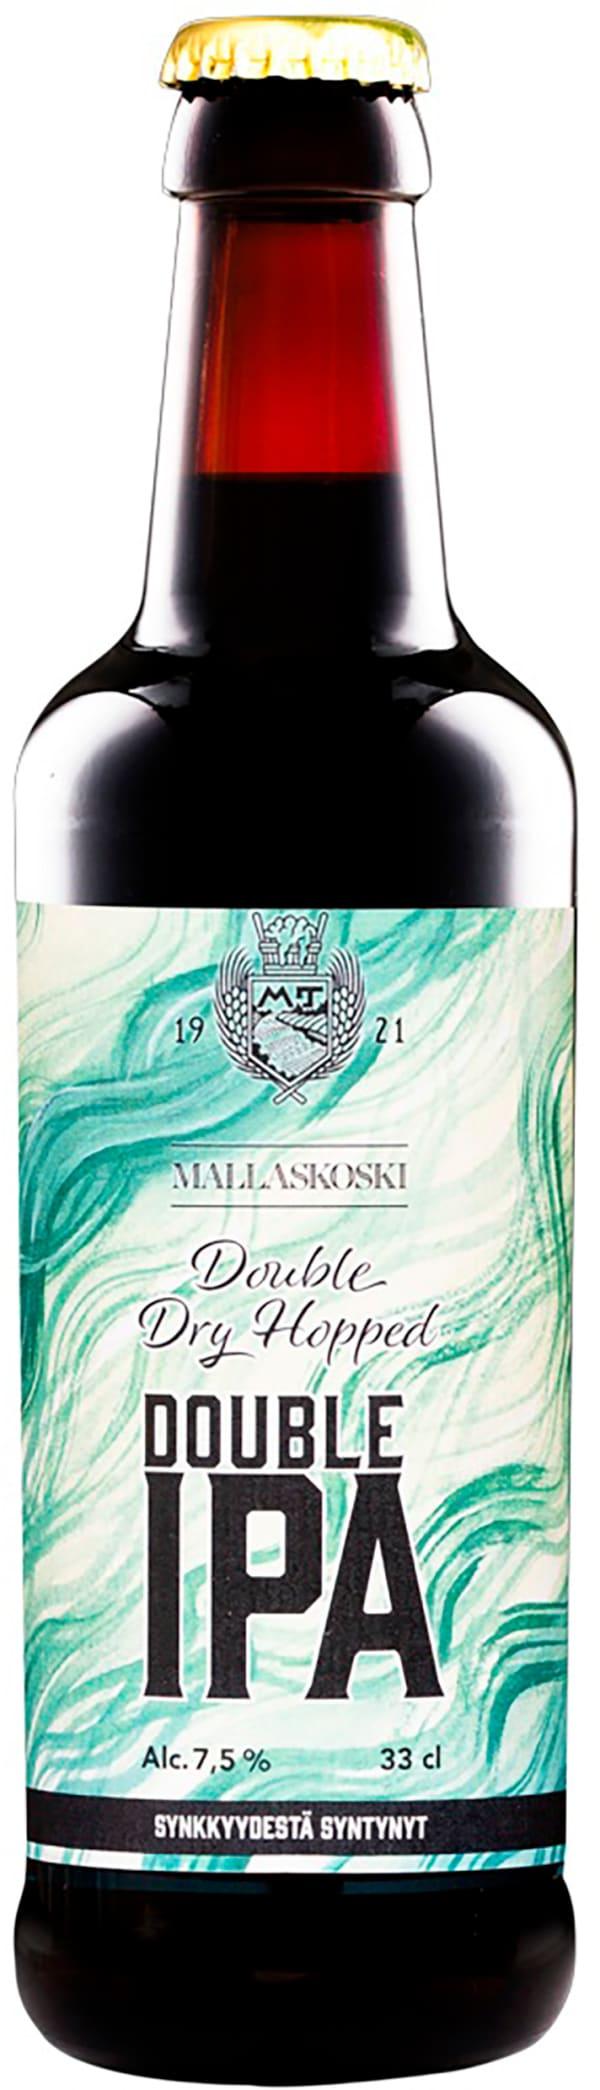 Mallaskoski Double Dry Hopped Double IPA